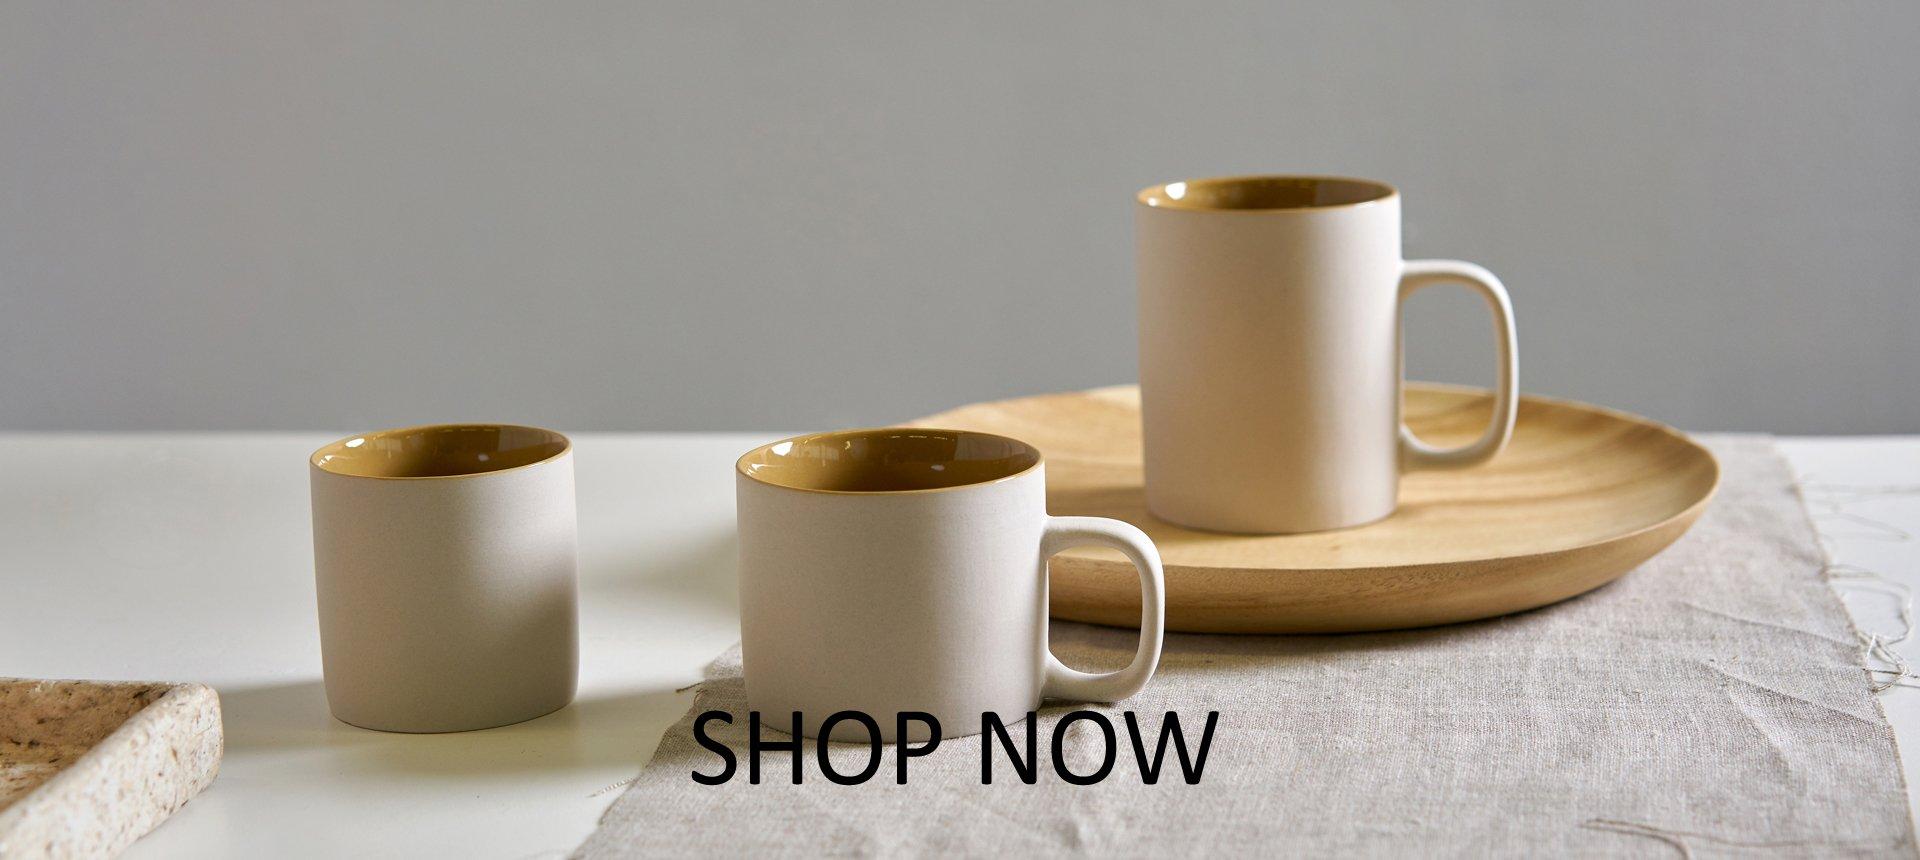 new collection ceramics mustard